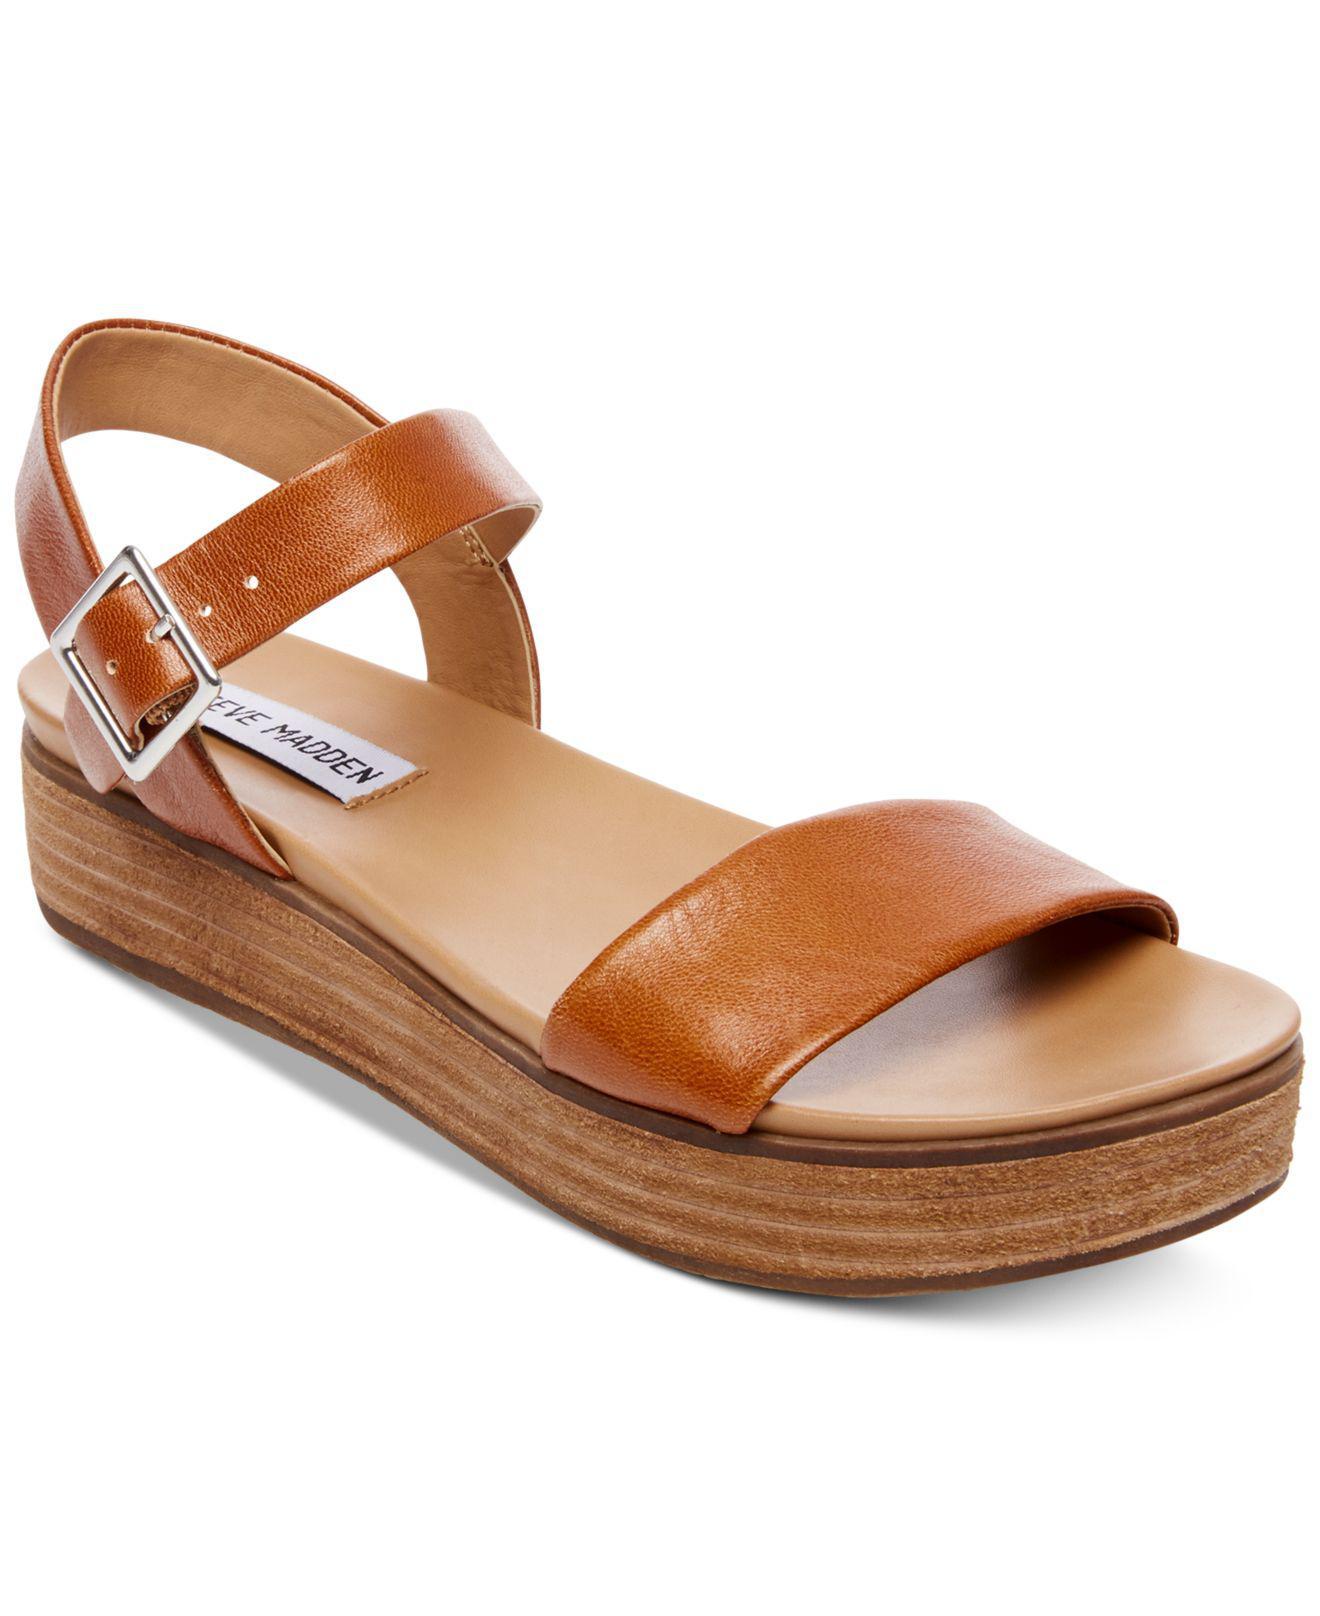 a416e0a29e2 Lyst - Steve Madden Aida Flatform Sandals in Brown